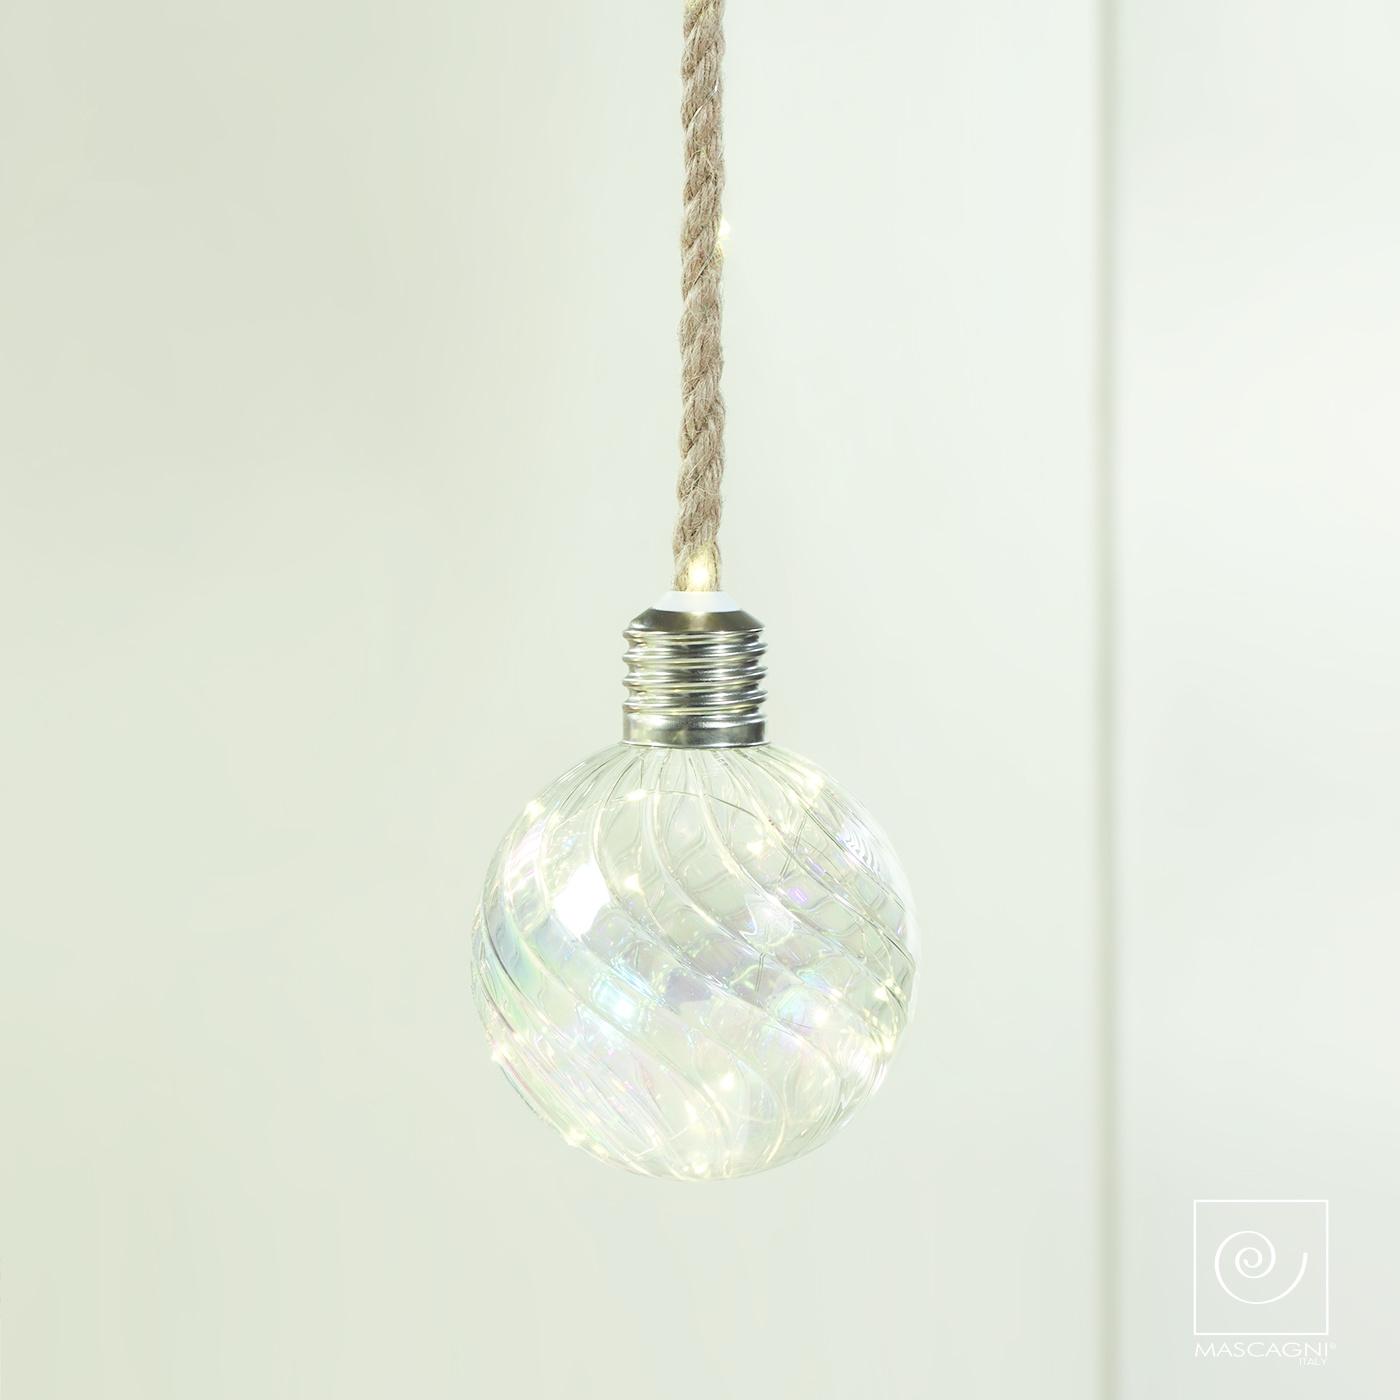 Art Mascagni LED BALL CM.12